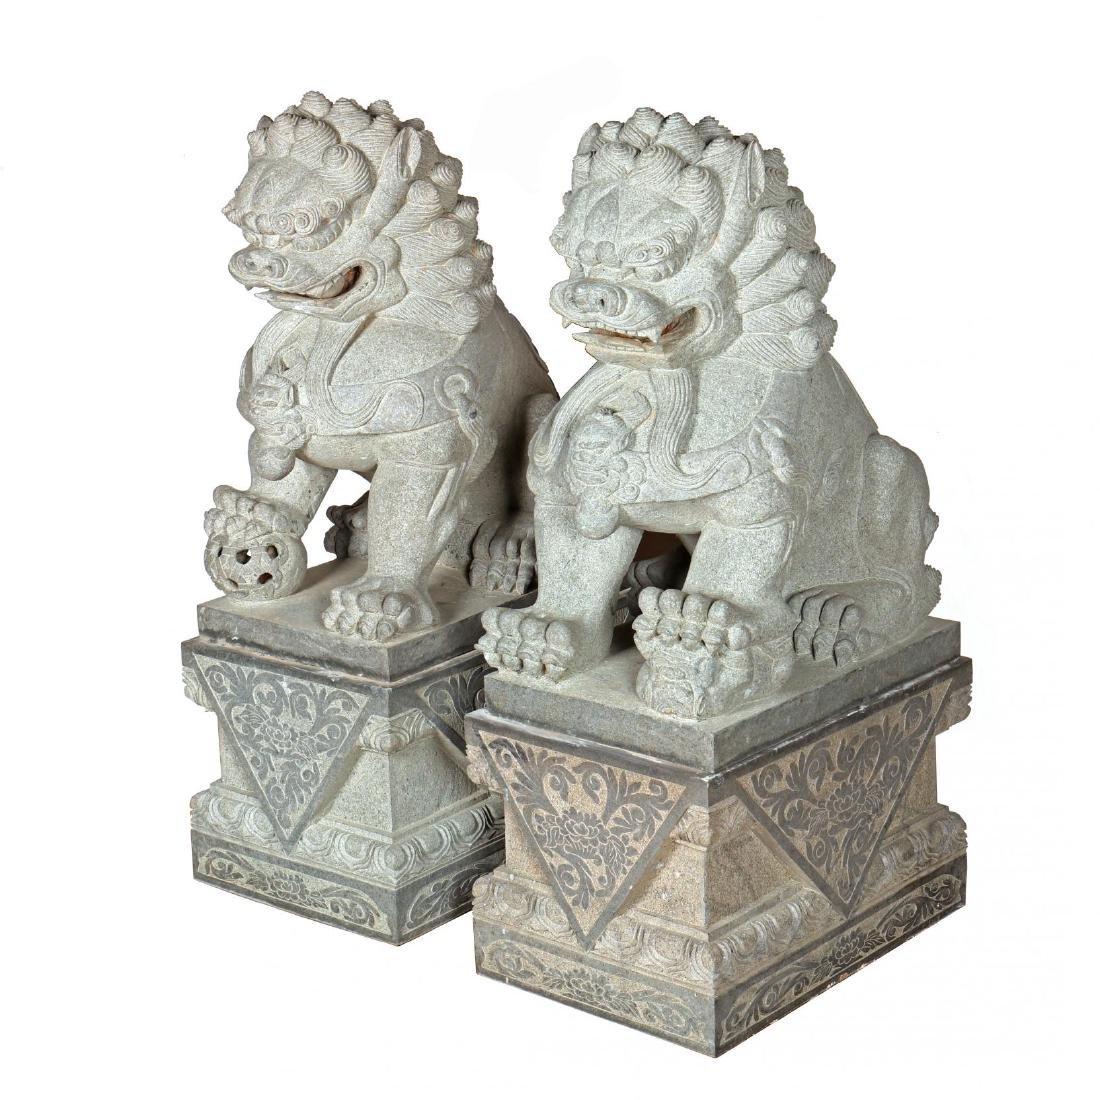 A Pair of Monumental Carved Granite Foo Lions